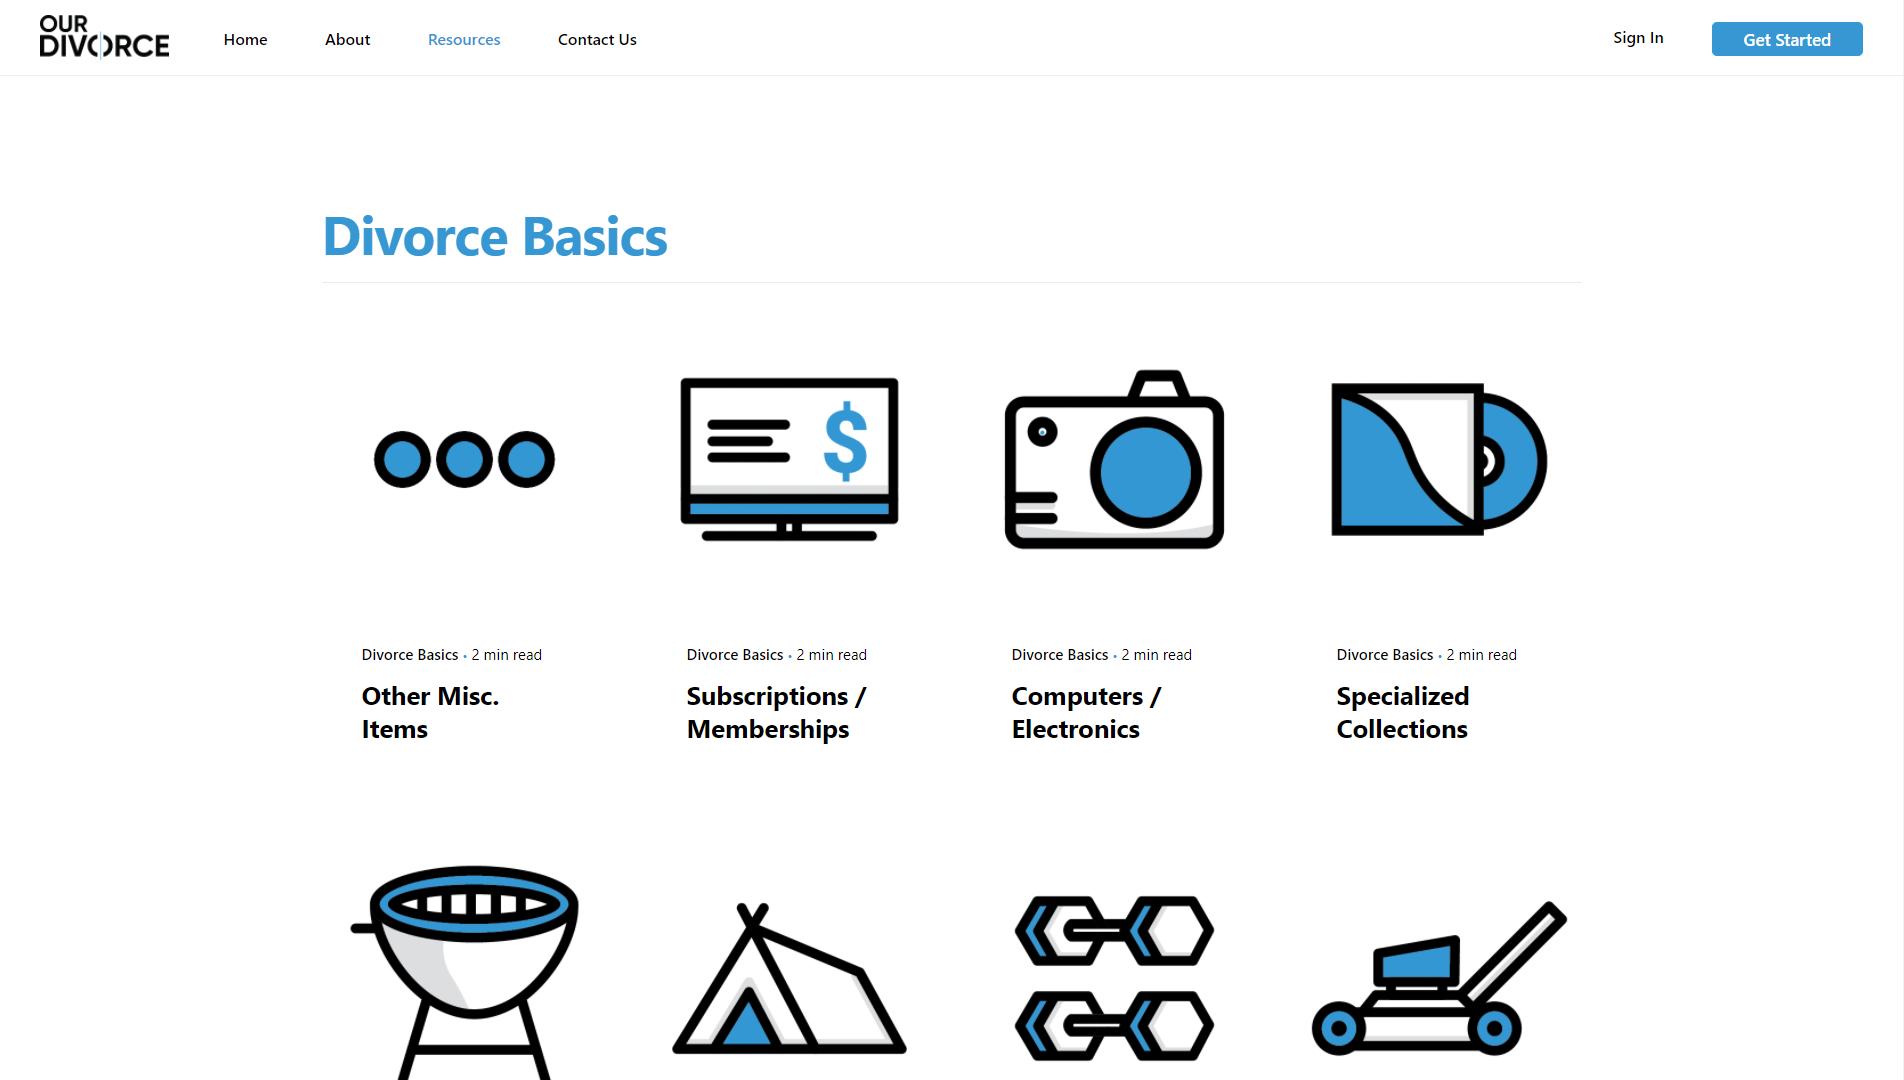 OurDivorce Resources Page Design